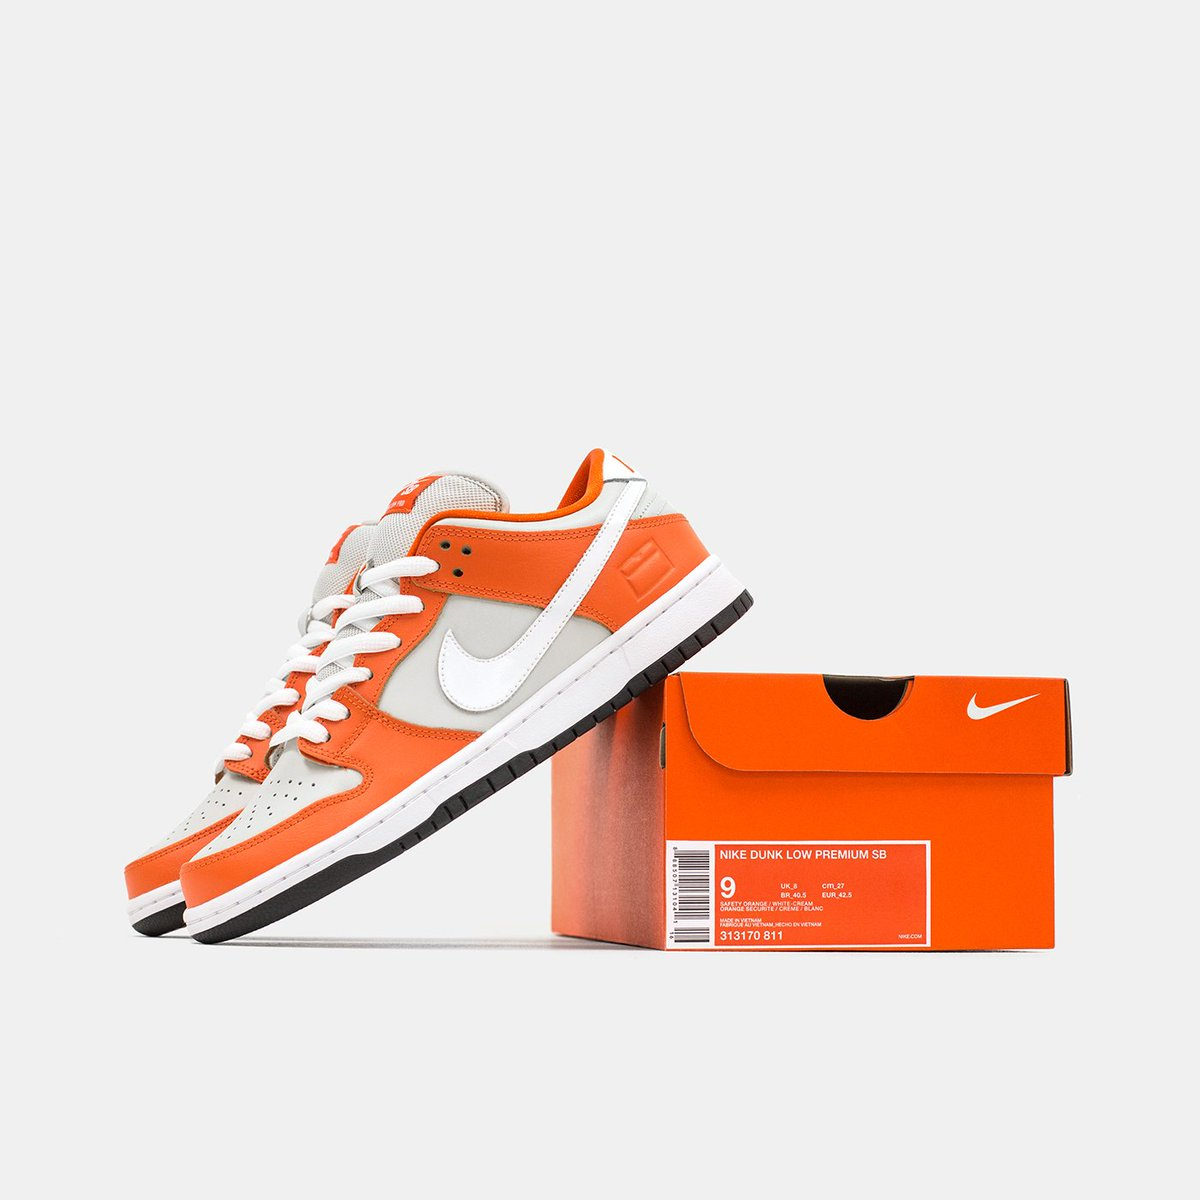 The Nike SB Dunk Low Premium